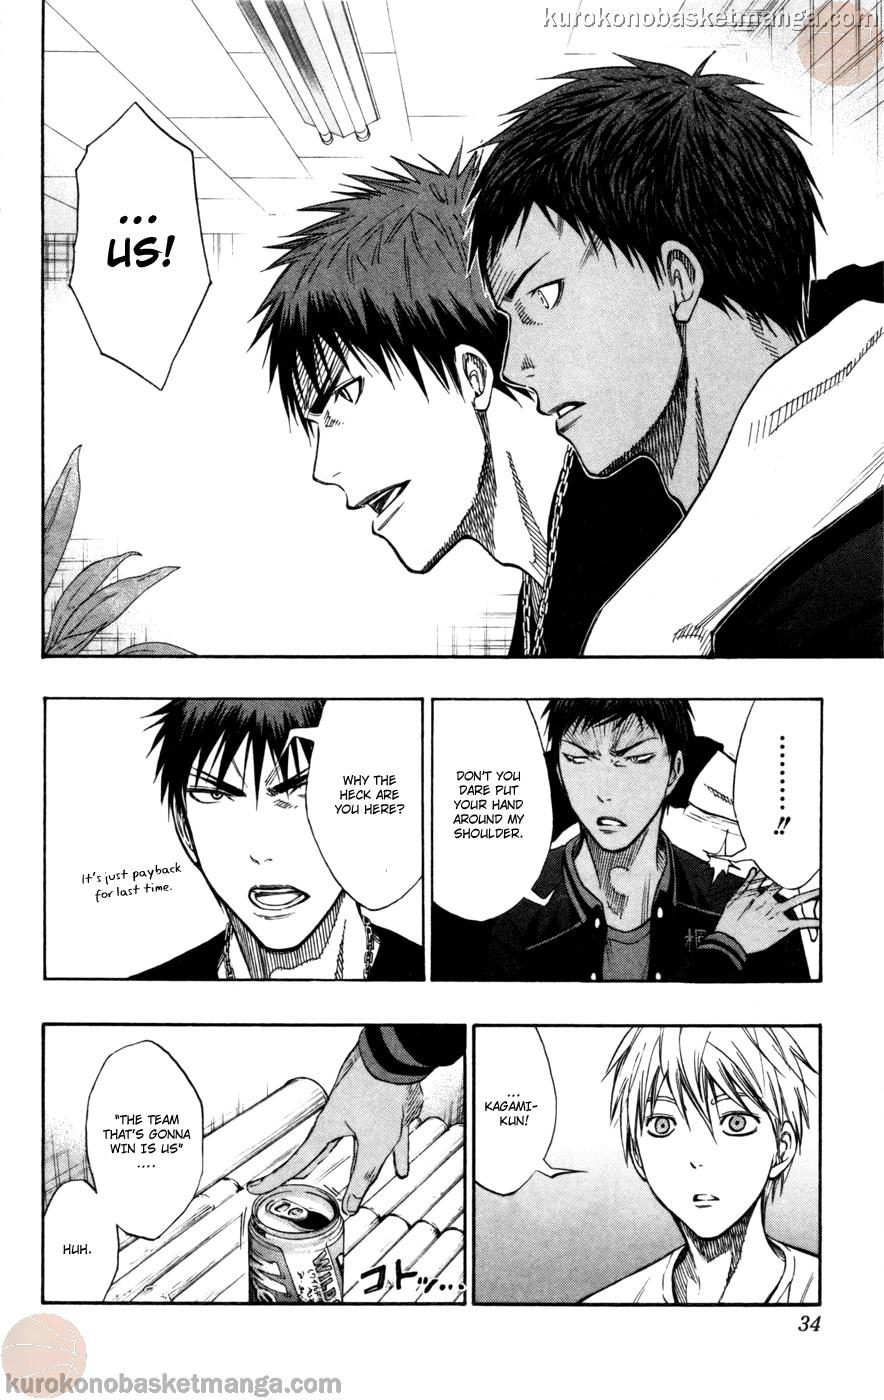 Kuroko no Basket Manga Chapter 110 - Image 08